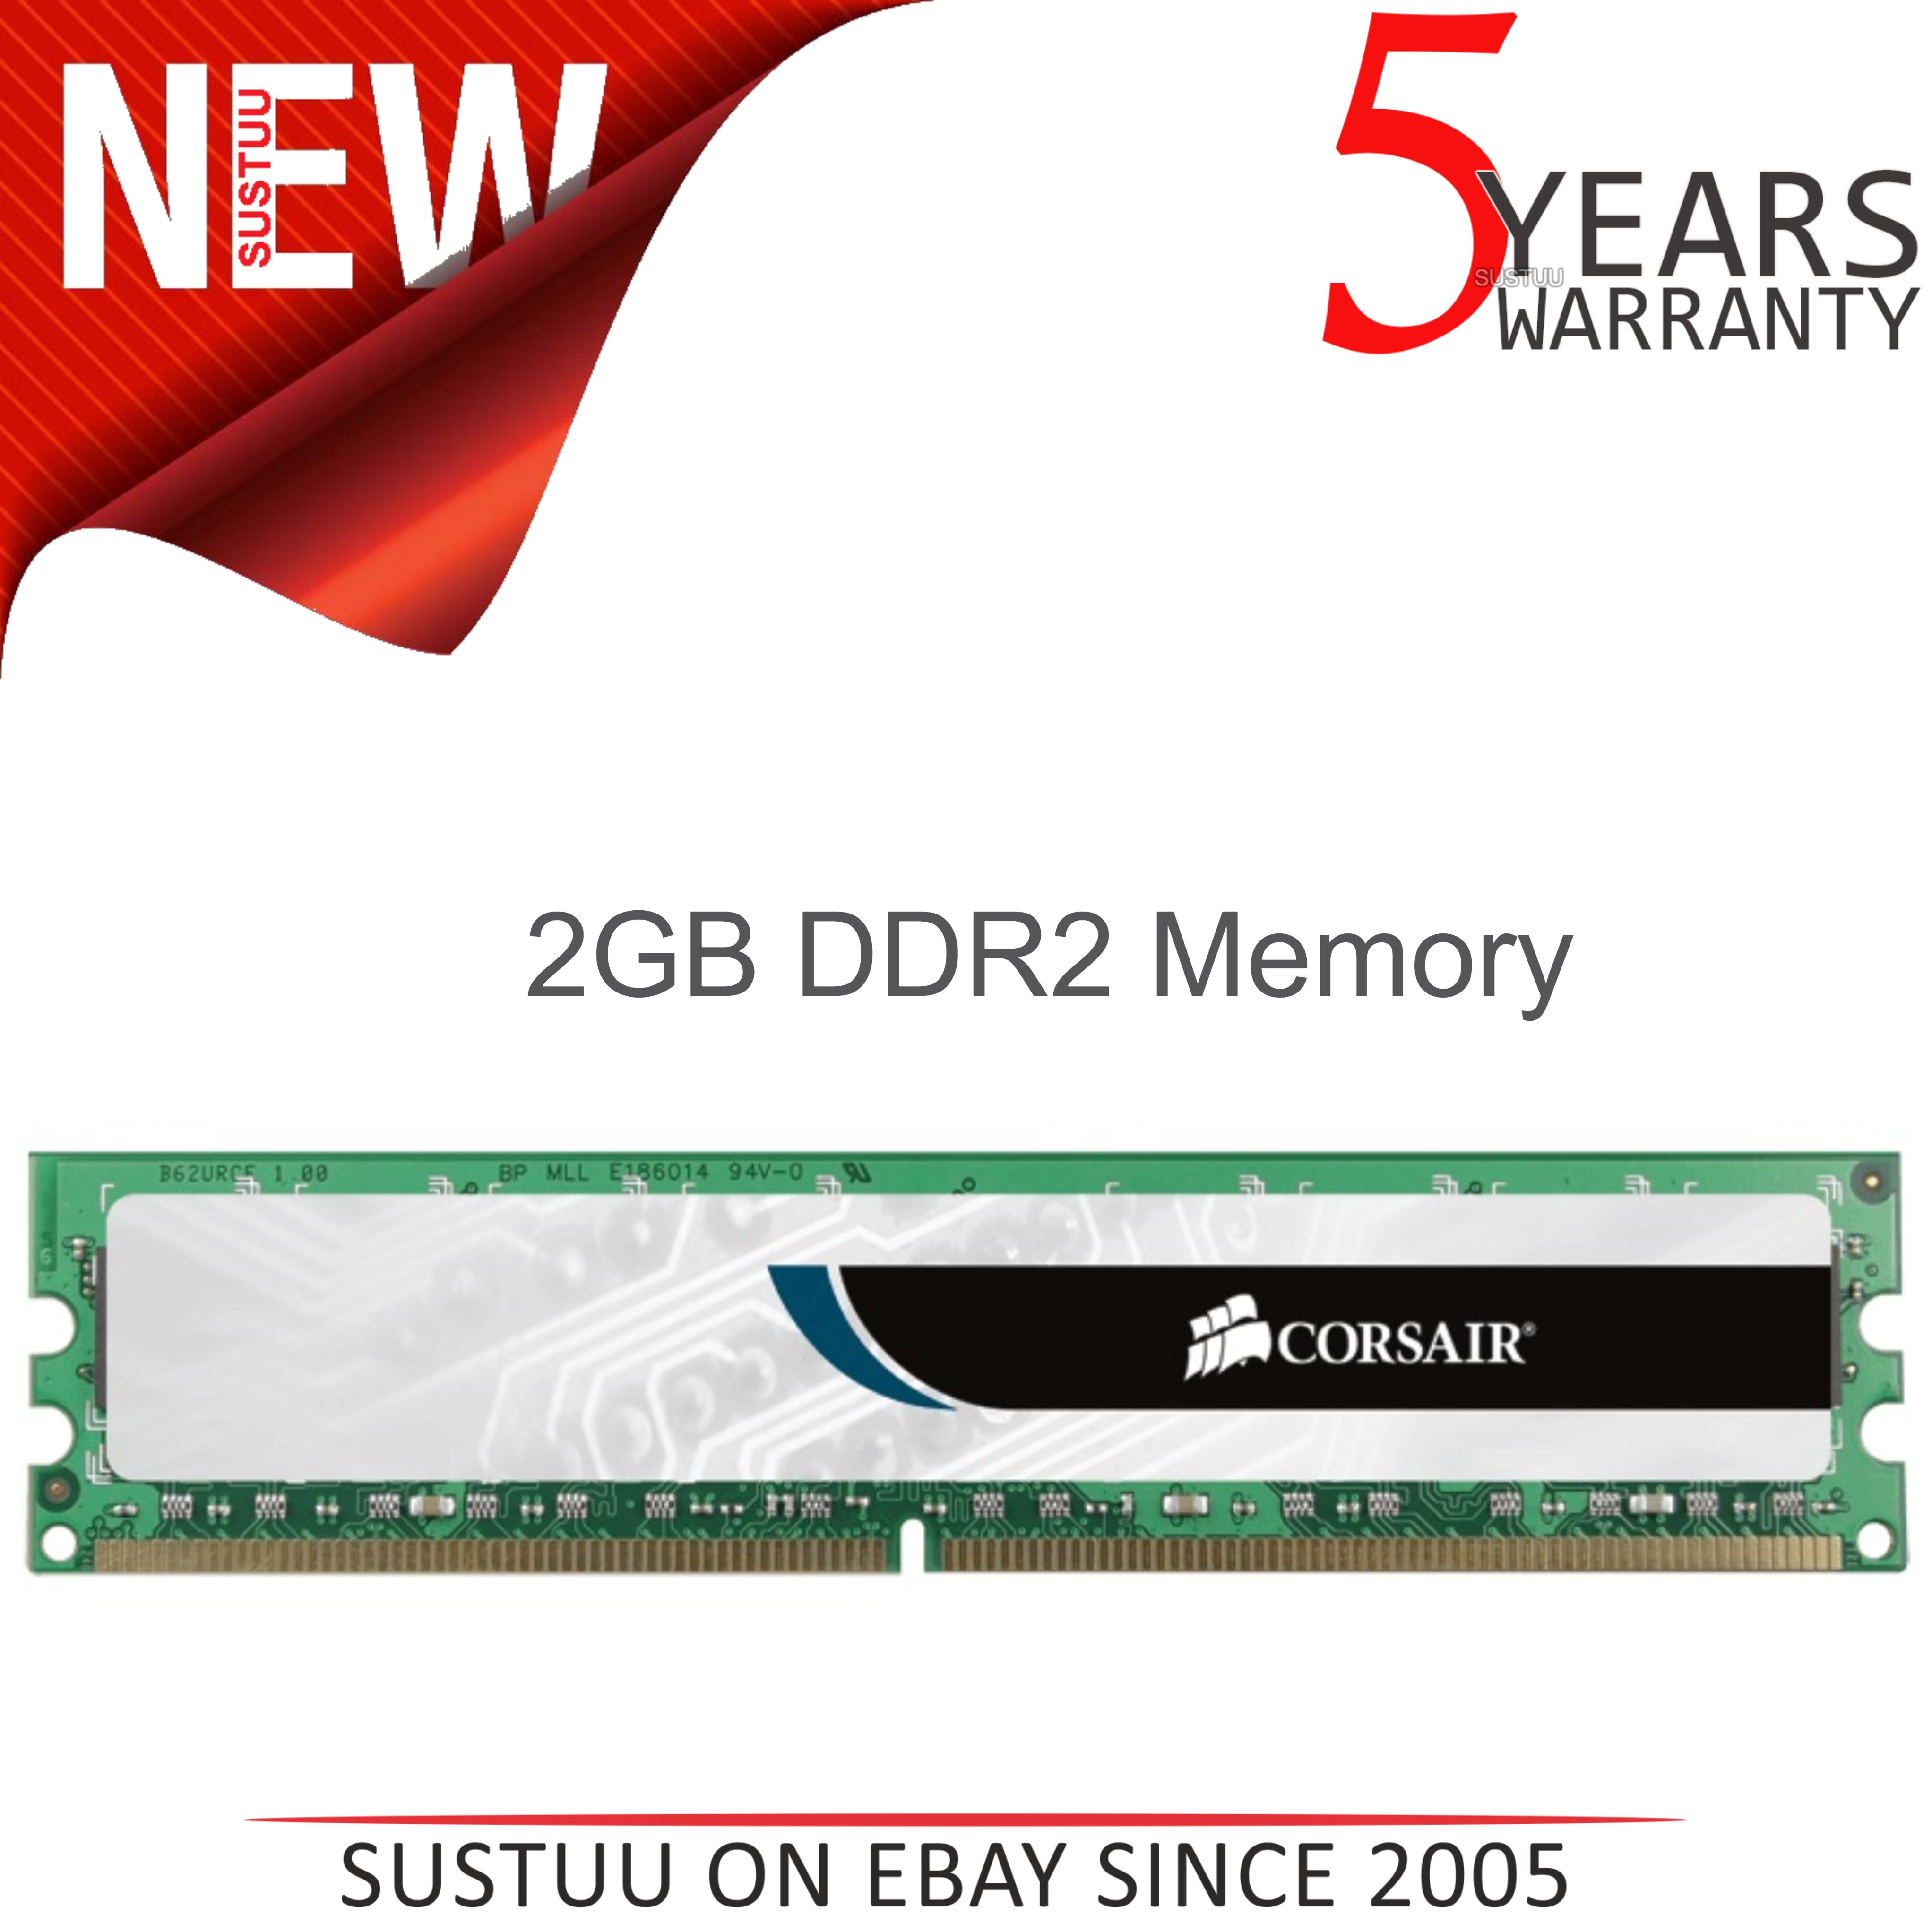 Corsair 2GB (1x2GB) DDR2 DIMM Desktop Memory Kit | RAM Module | 800 Mhz | 1.8 Voltage